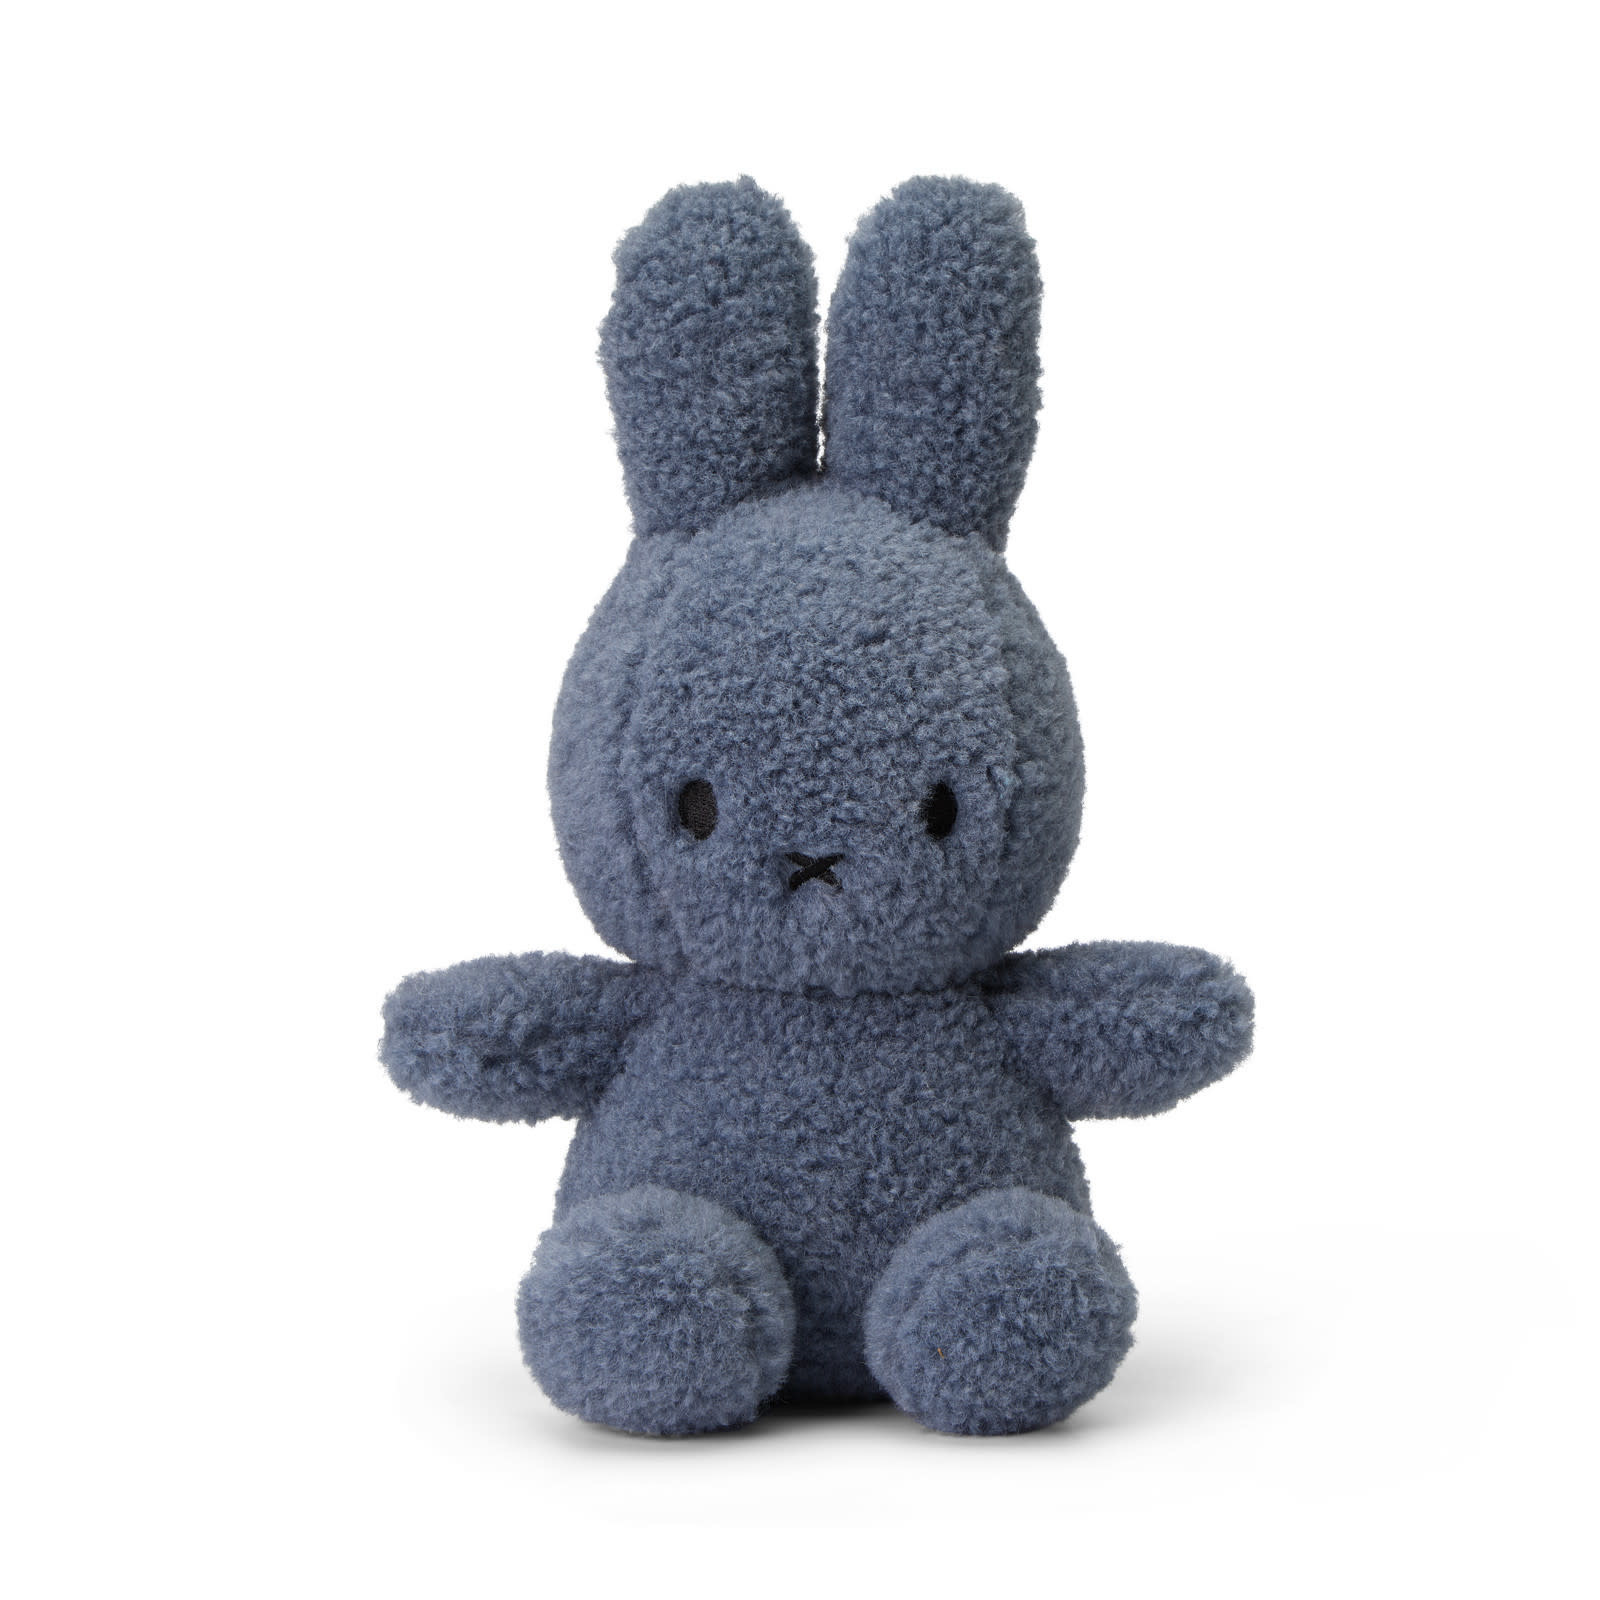 "Miffy Teddy Blue - 23 cm - 9"" - 100% recycled"